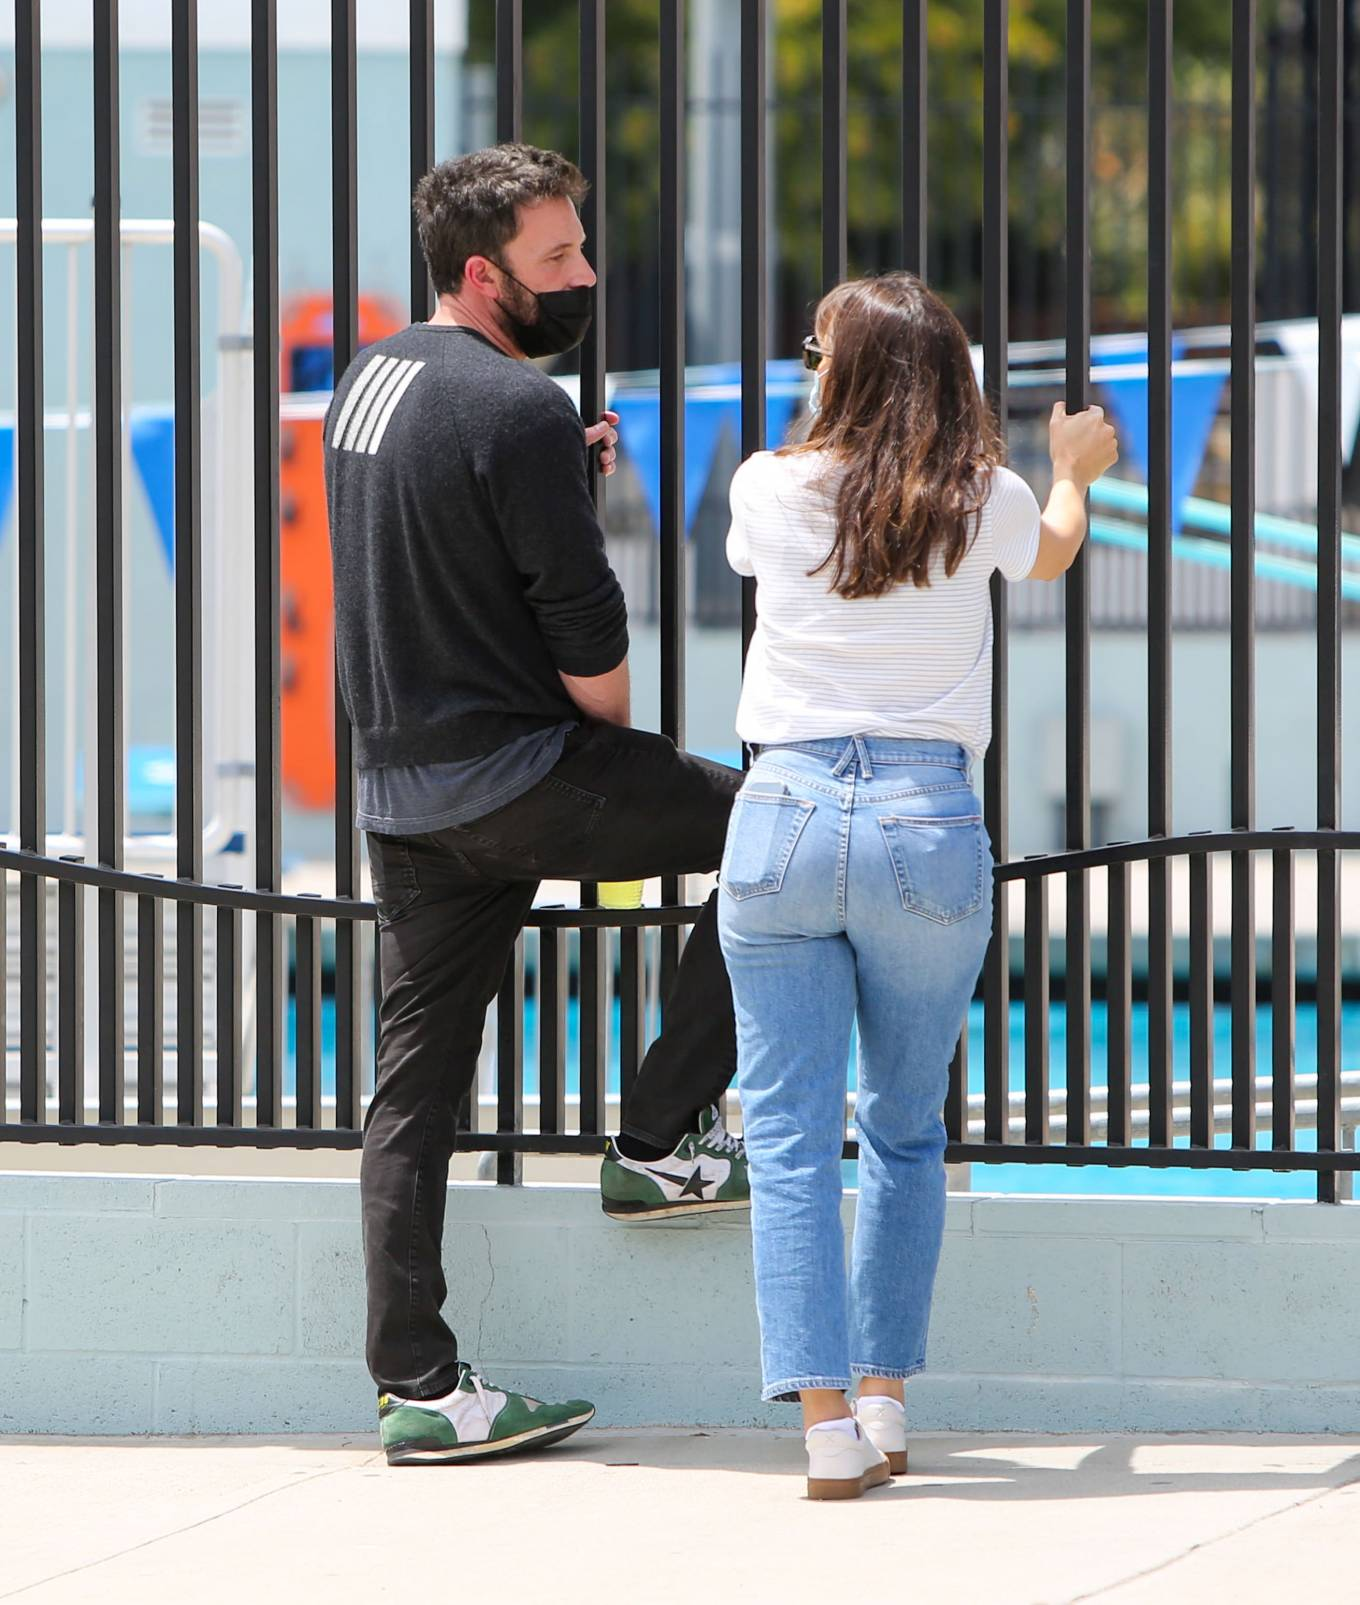 Jennifer Garner - Seen with her son Samuel in Los Angeles